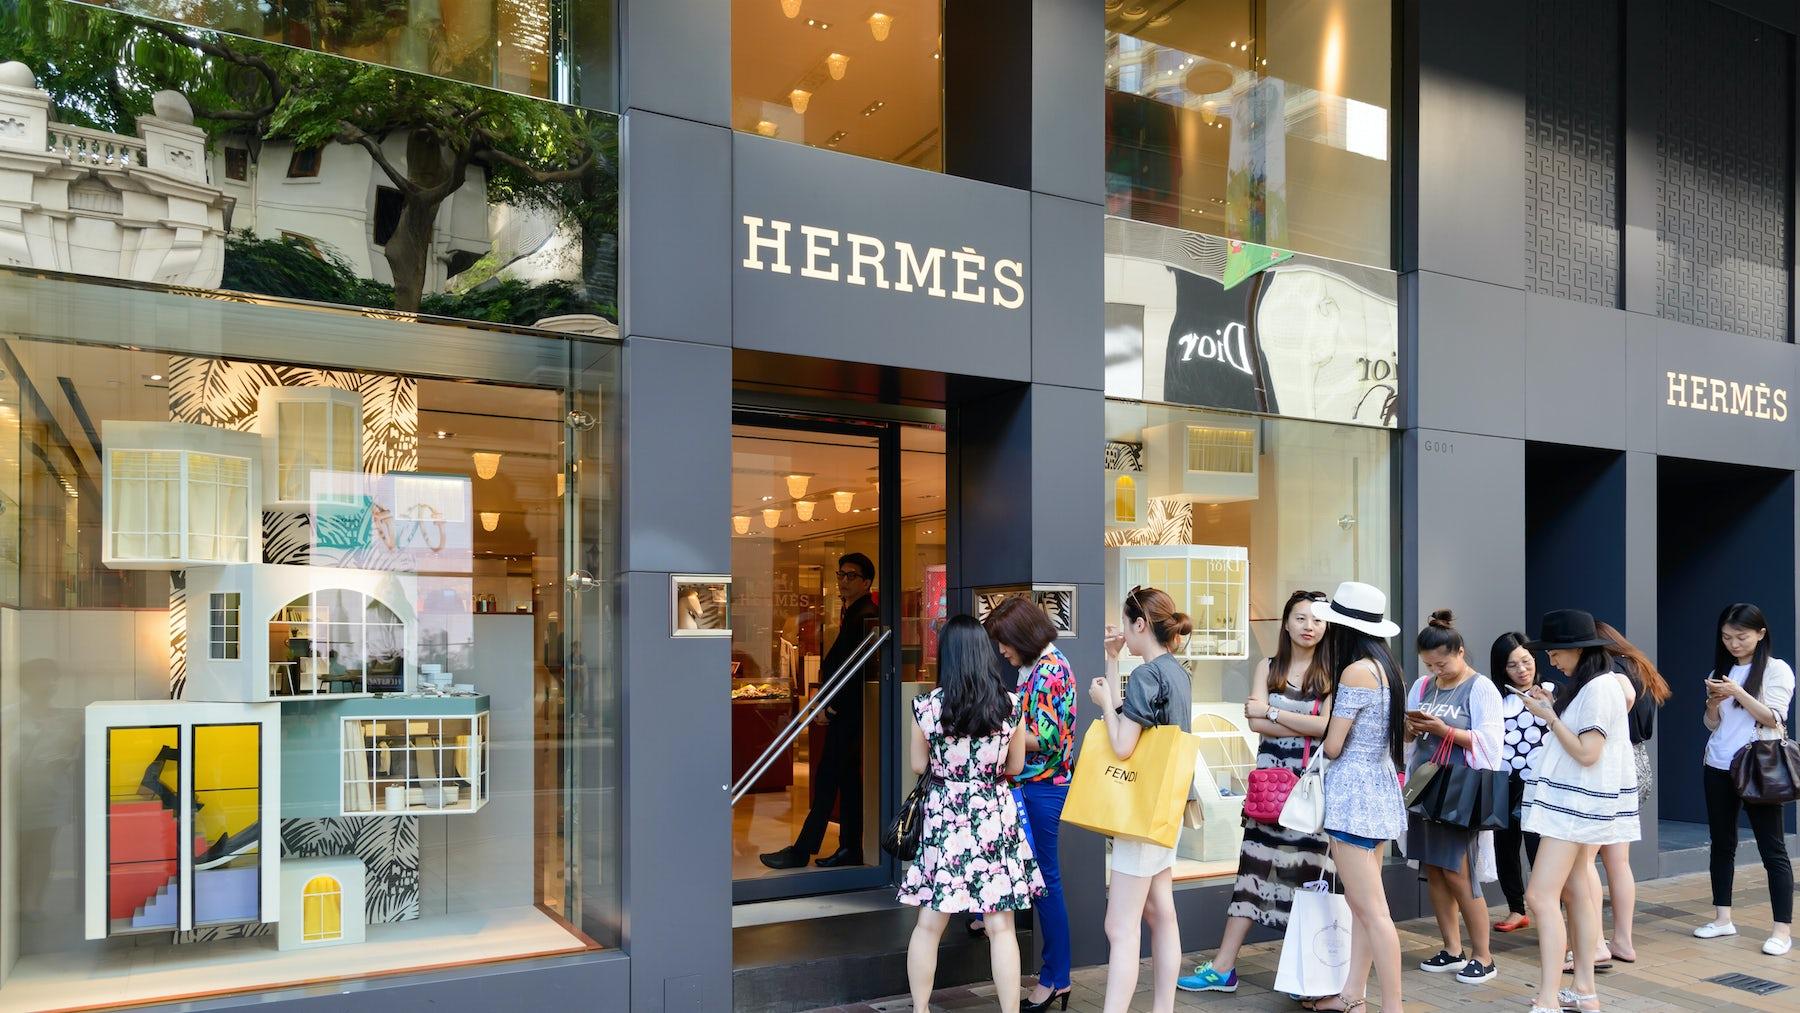 Hermès store, Hong Kong   Source: Shutterstock